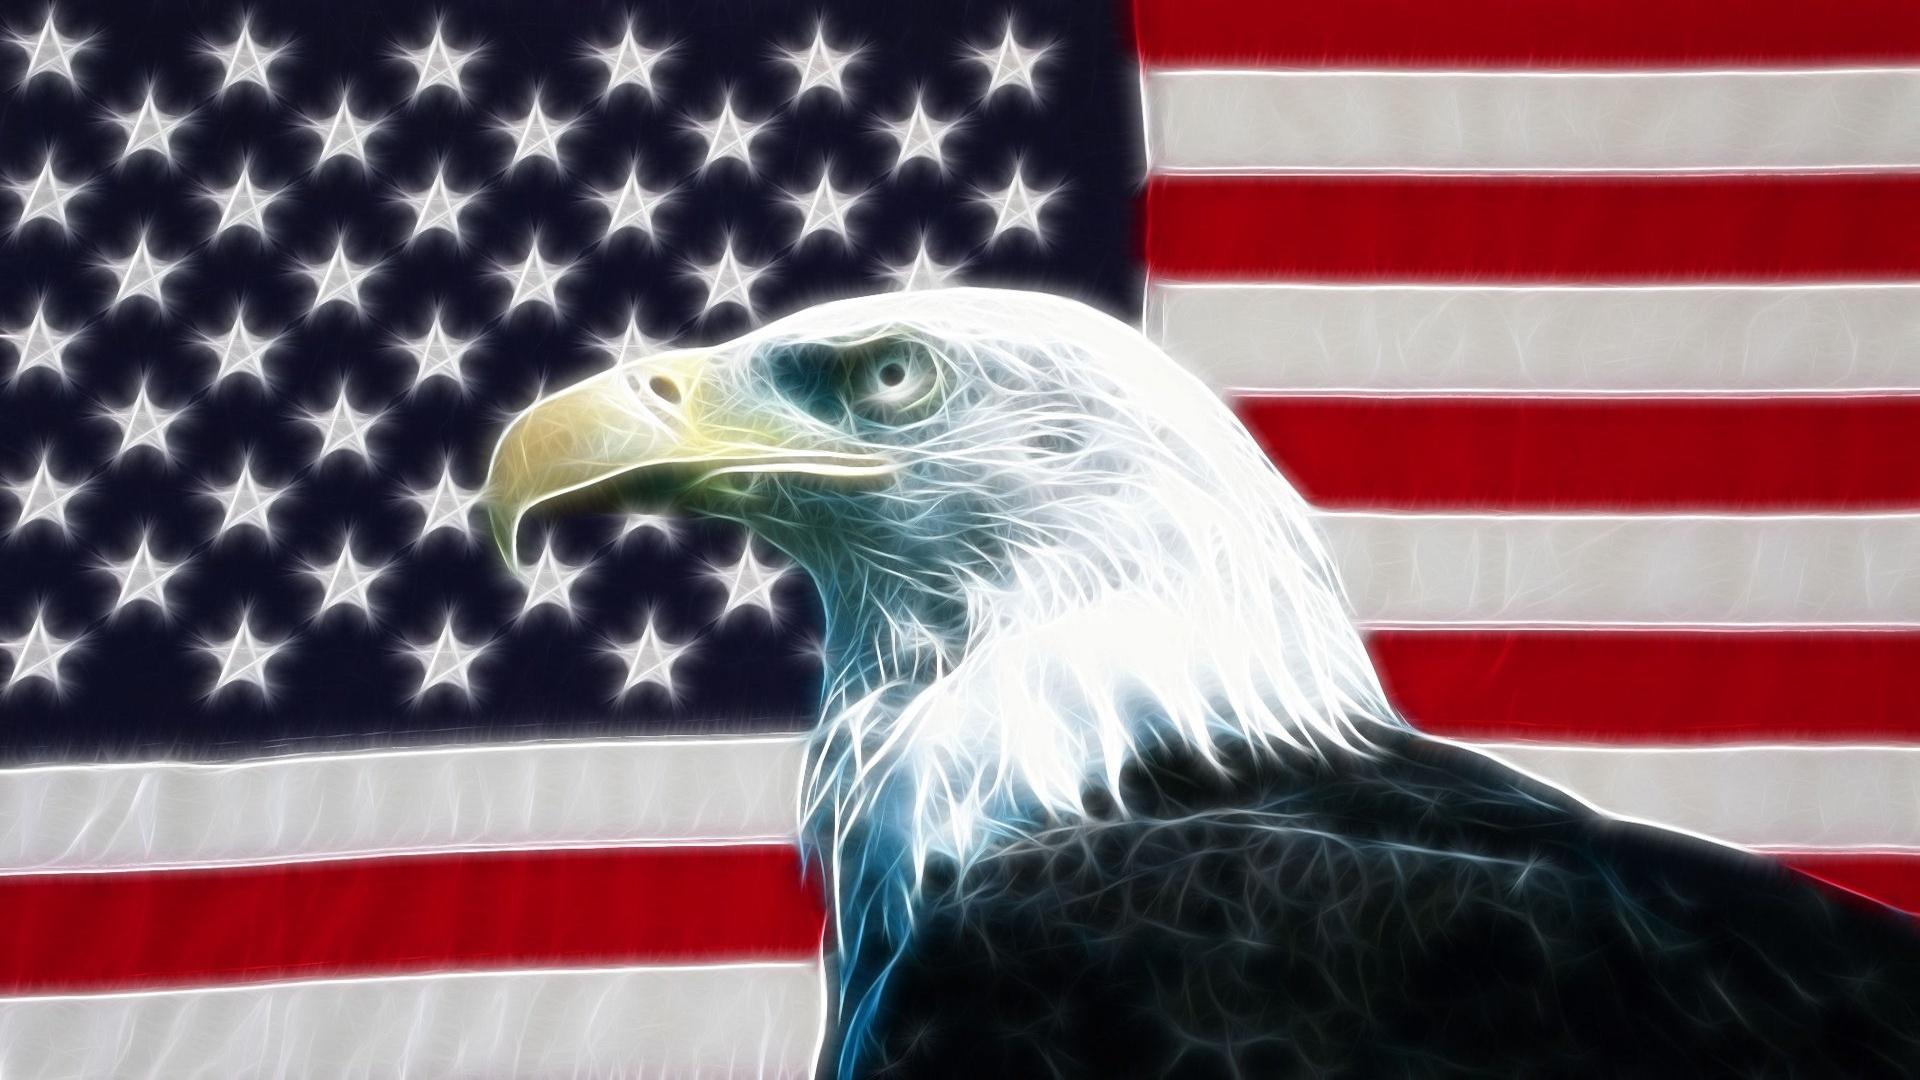 America Wallpaper wallpaper: american history x wallpaper hd